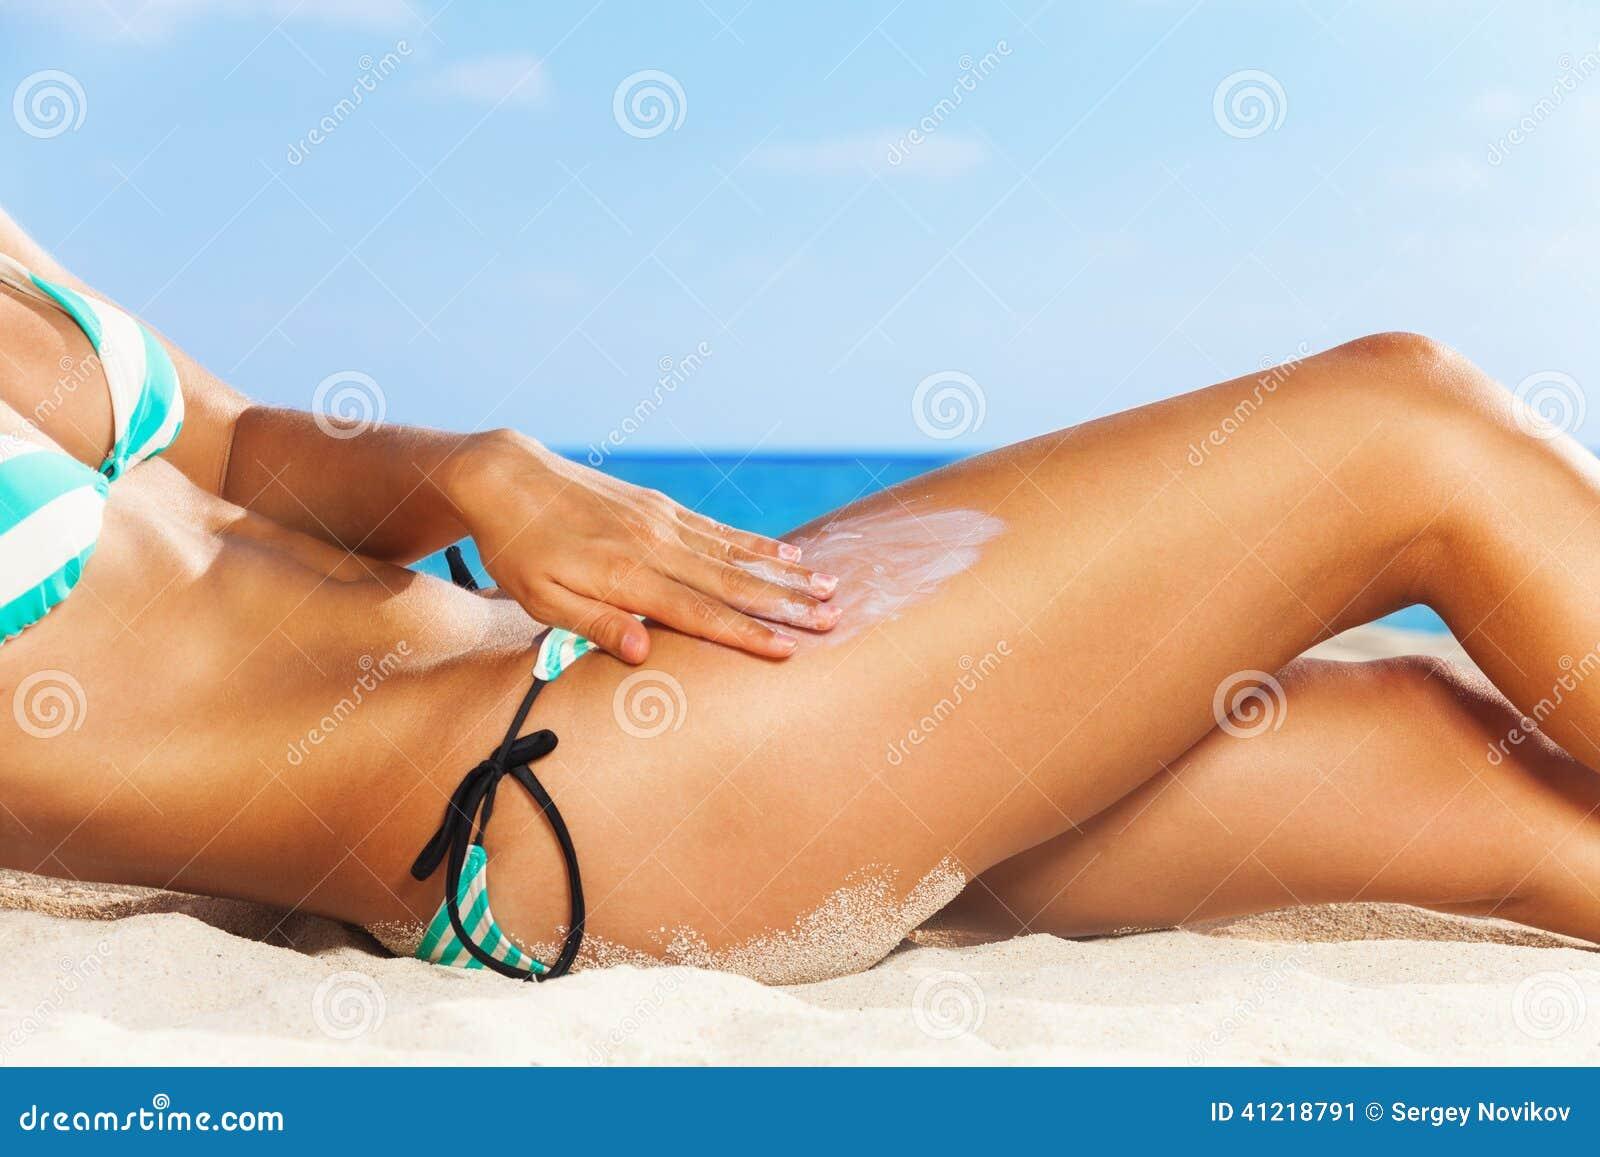 Beach applying sun cream